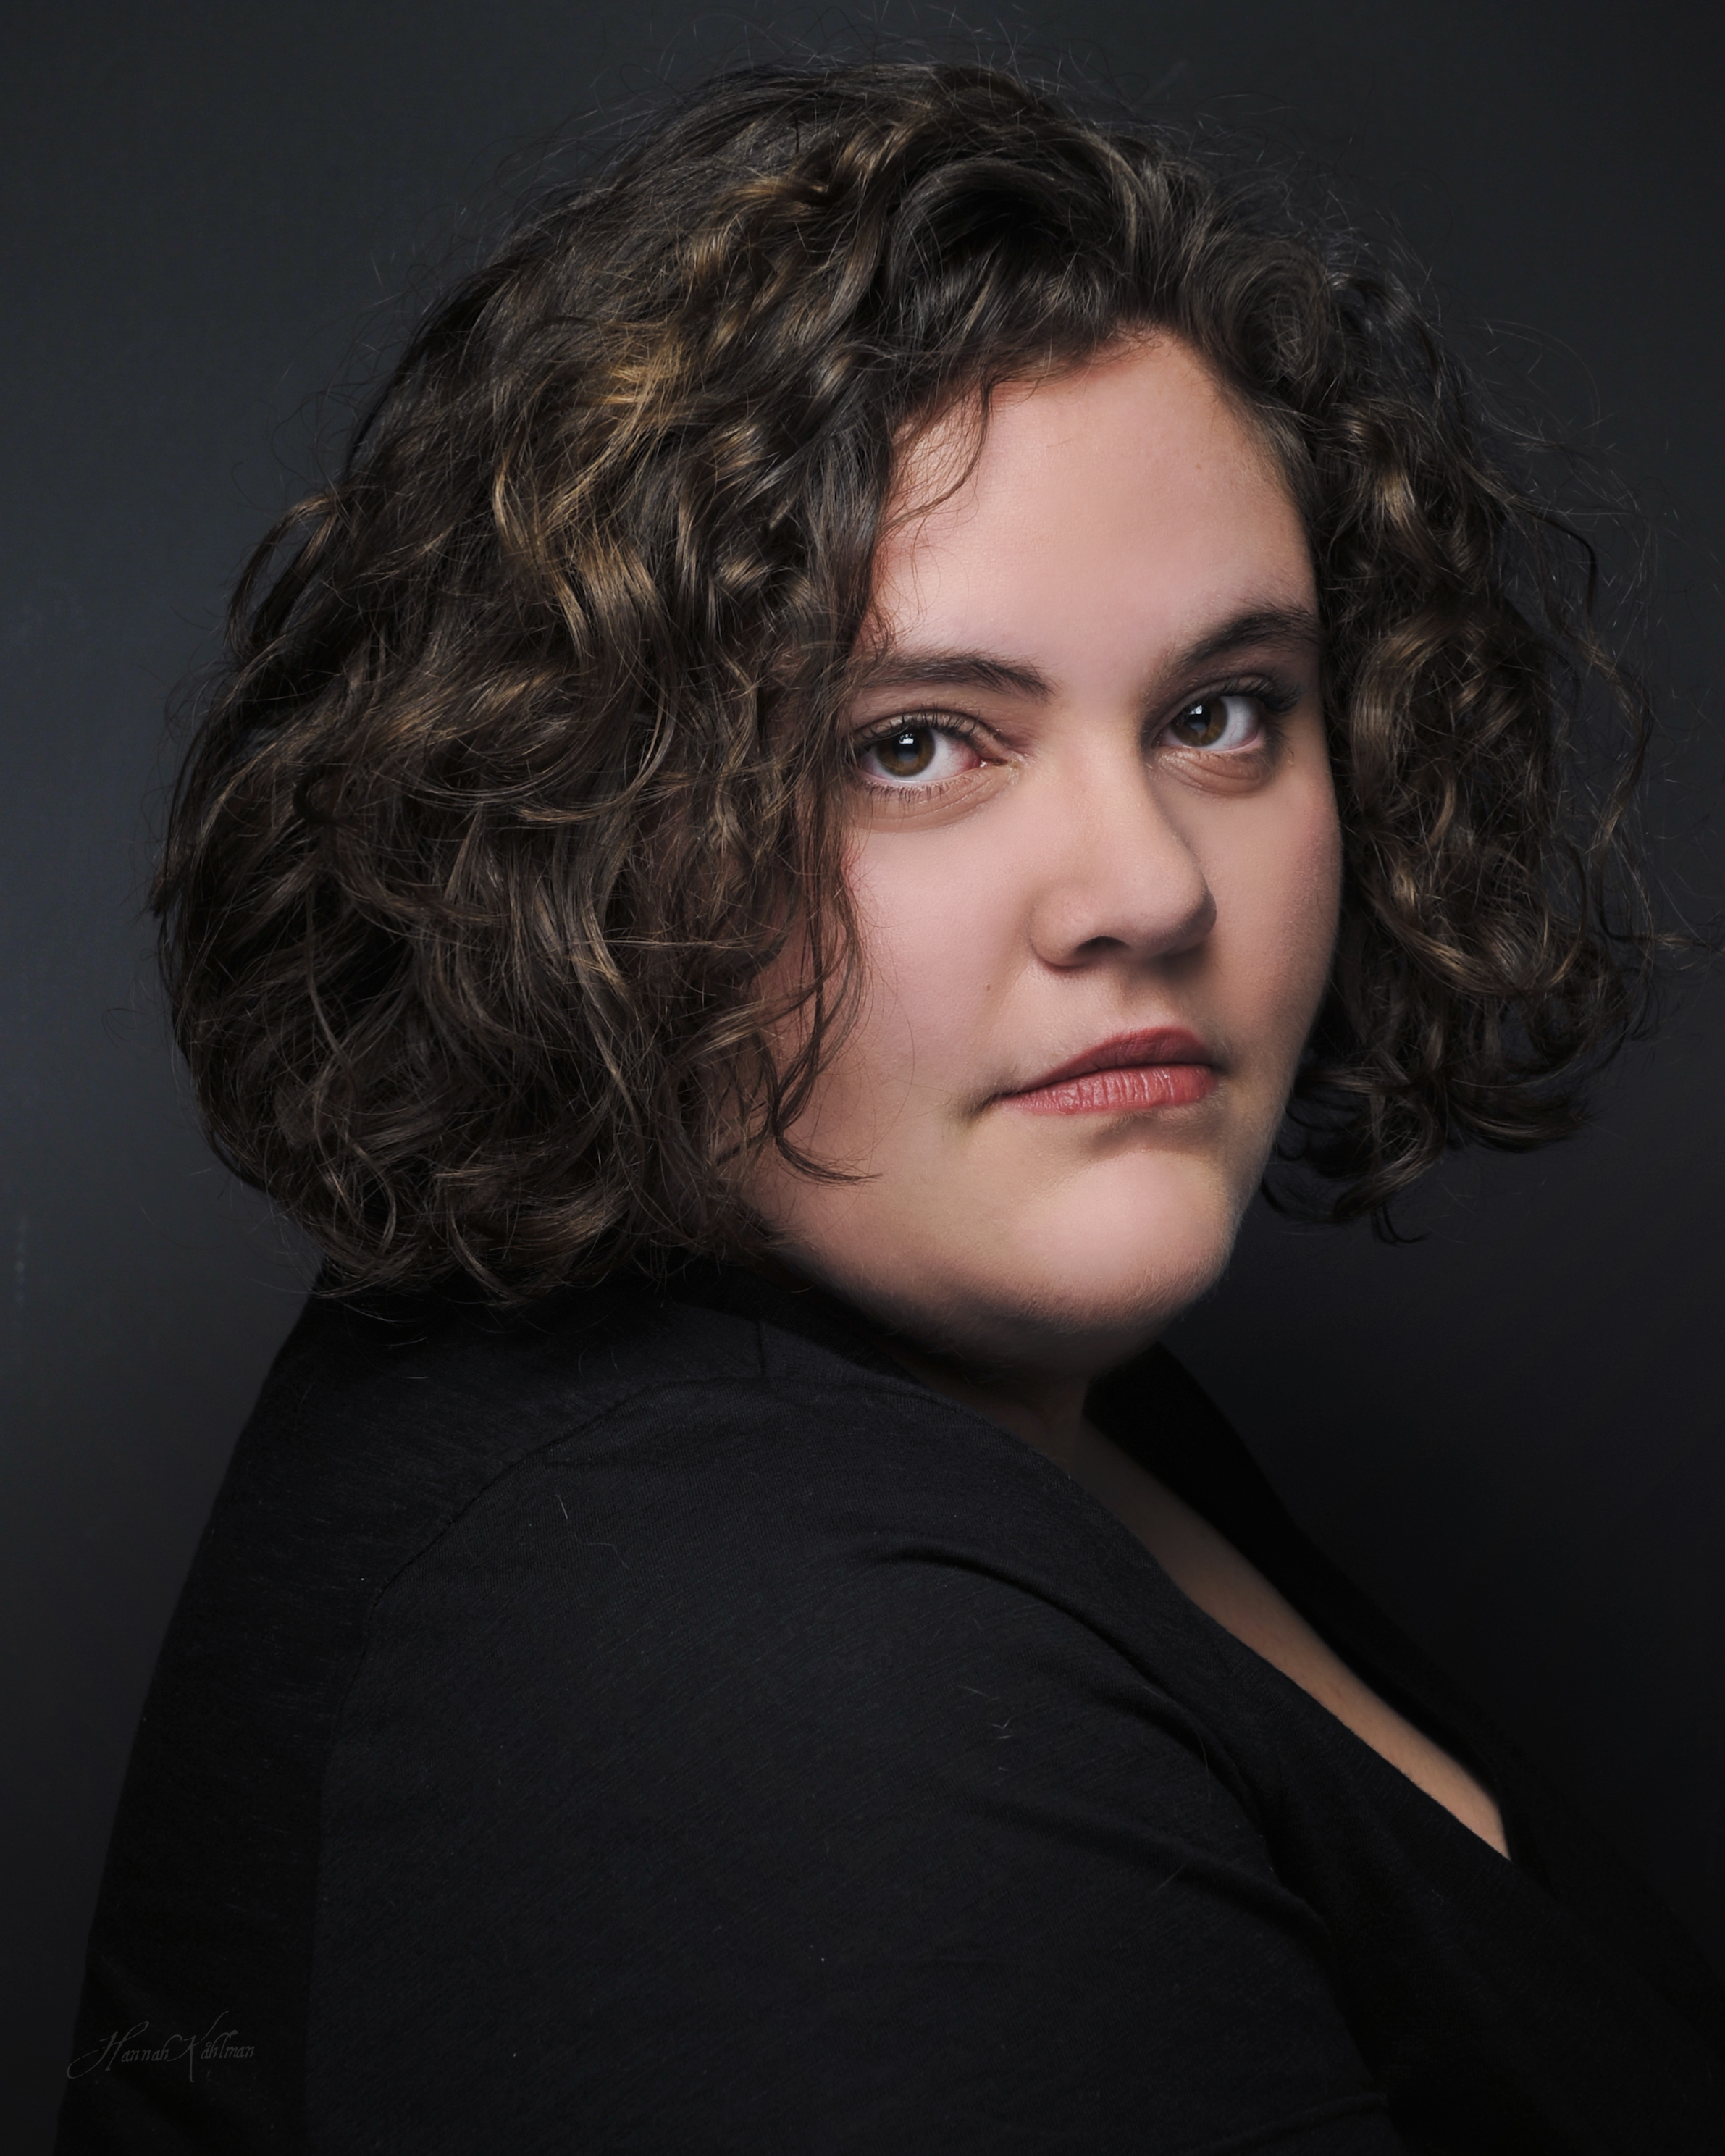 Headshot_of_model_actress_for_model_port